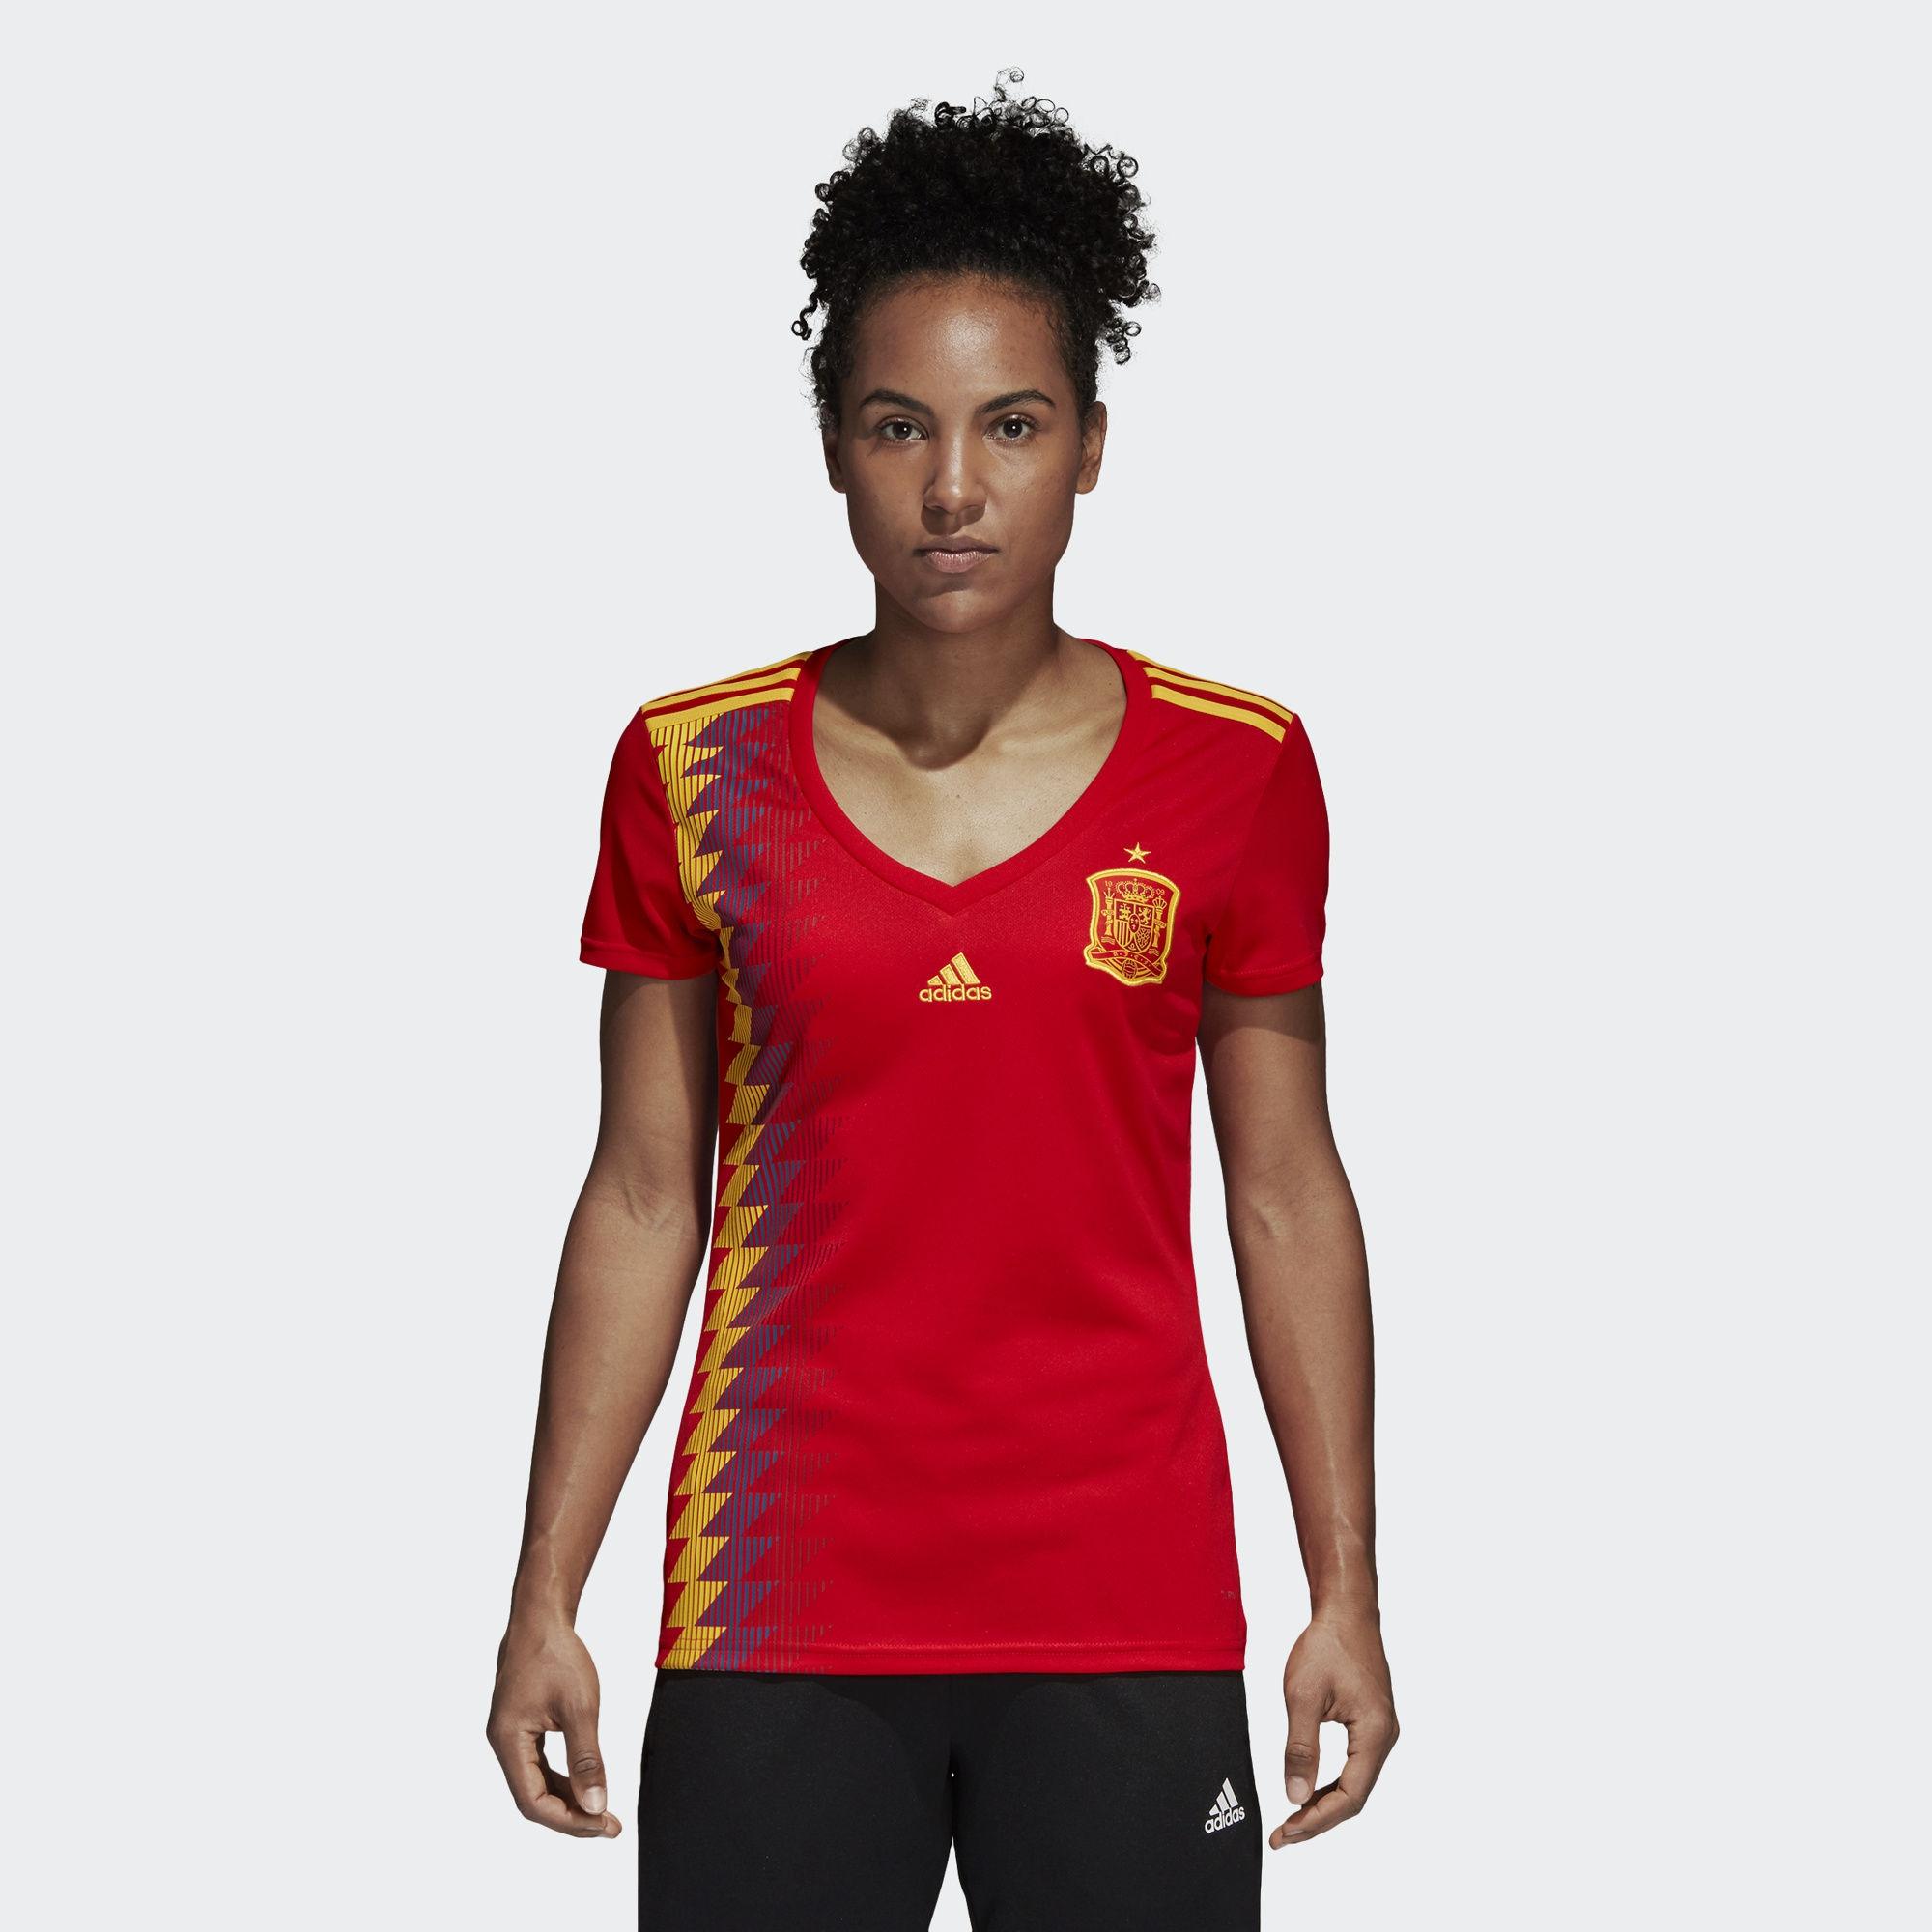 finest selection c0f0b a9bb6 Jersey - Women Spain Home World Cup Official 2018 Jersey Football Jersey  Onlin